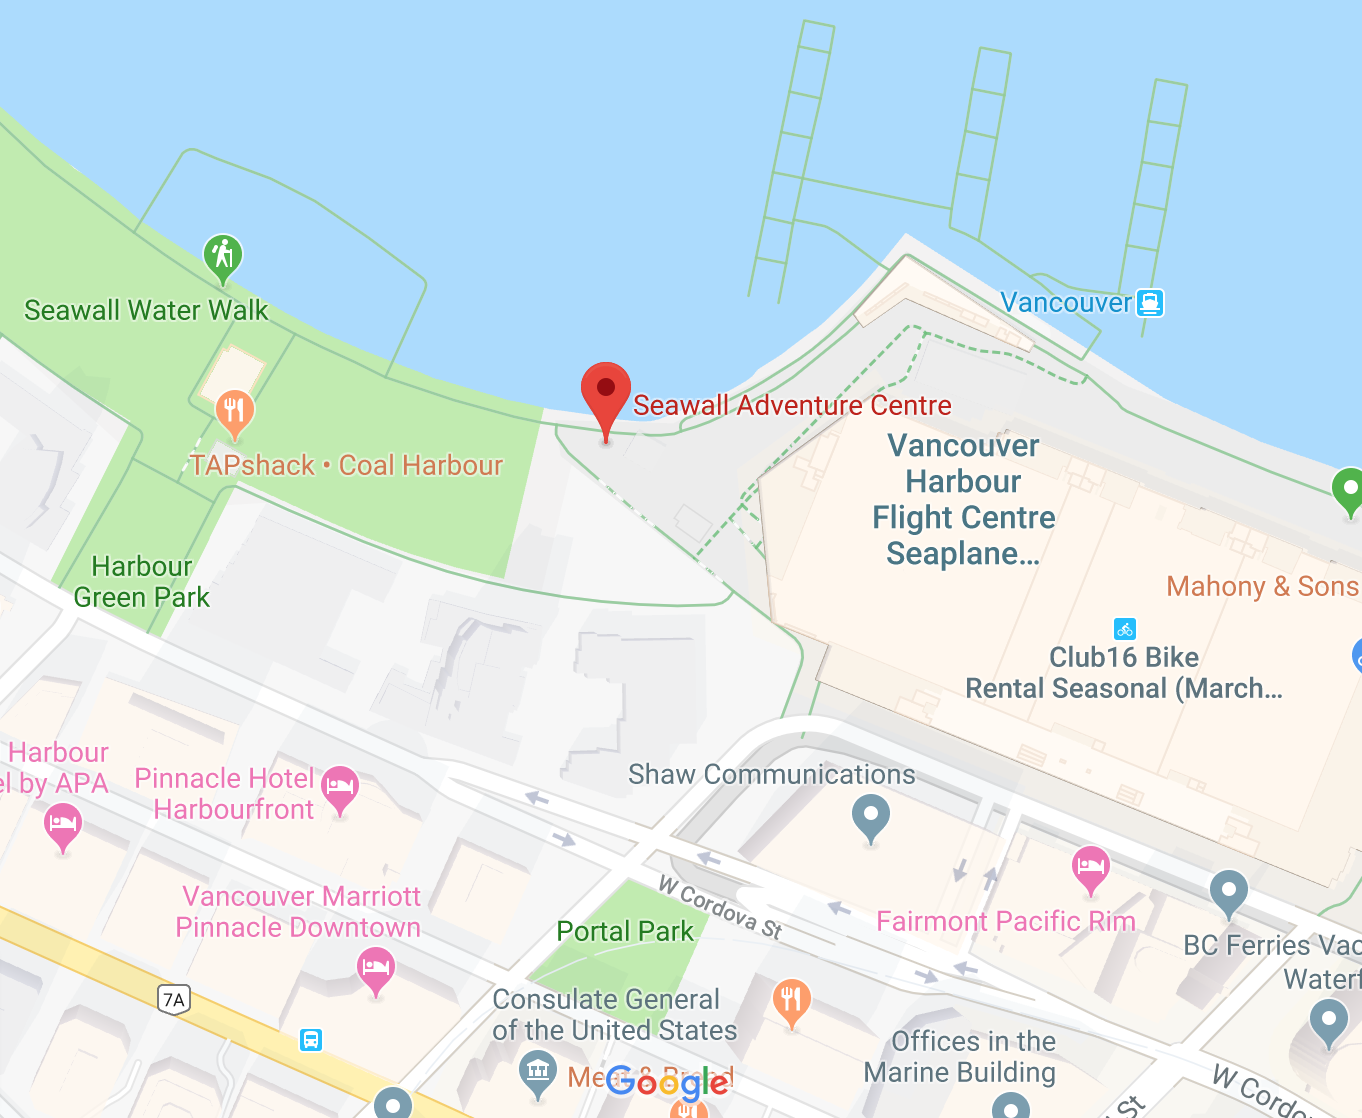 Seawall Adventure Centre Vancouver location